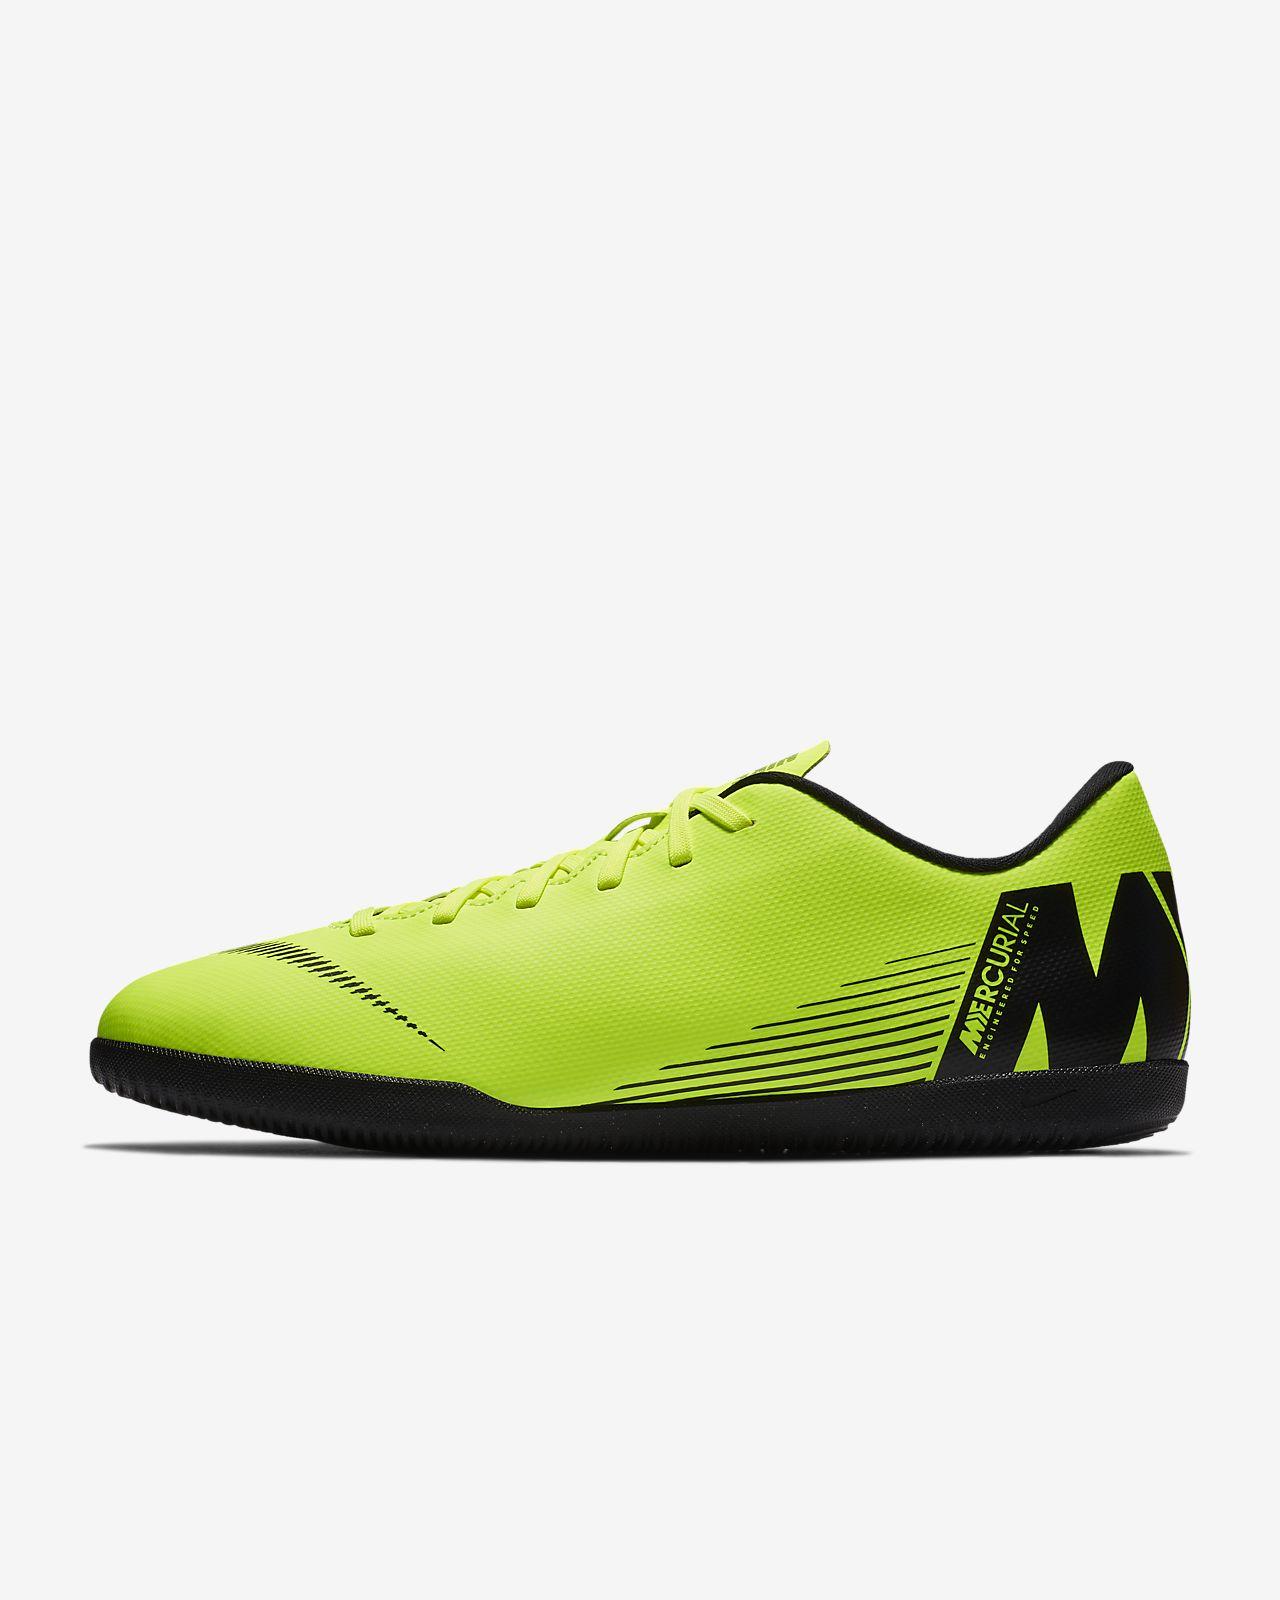 Calzado de fútbol para cancha cubierta Nike MercurialX Vapor XII Club IC abb6fede504